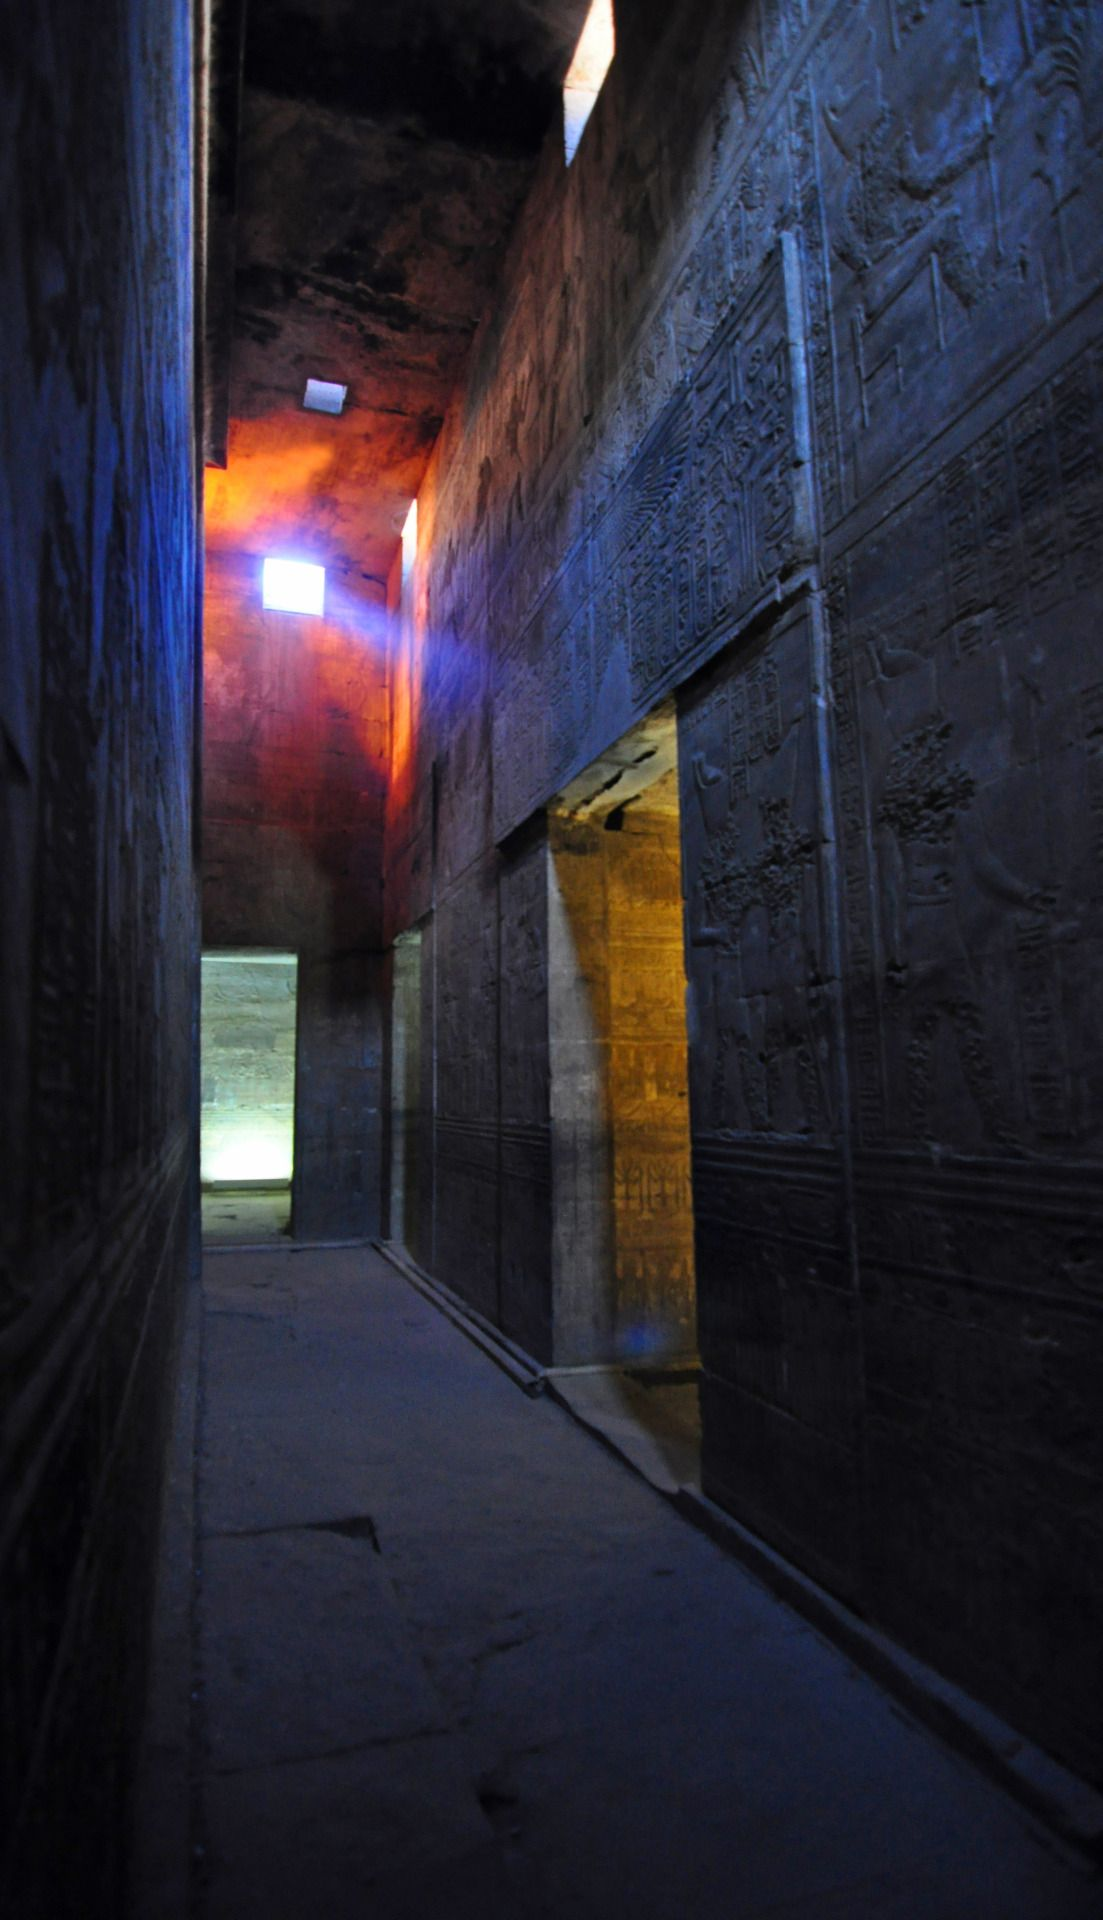 The Horus, Hathor and Harsomtus temple of Edfu, Upper Egypt. Germán Erostarbe 2015